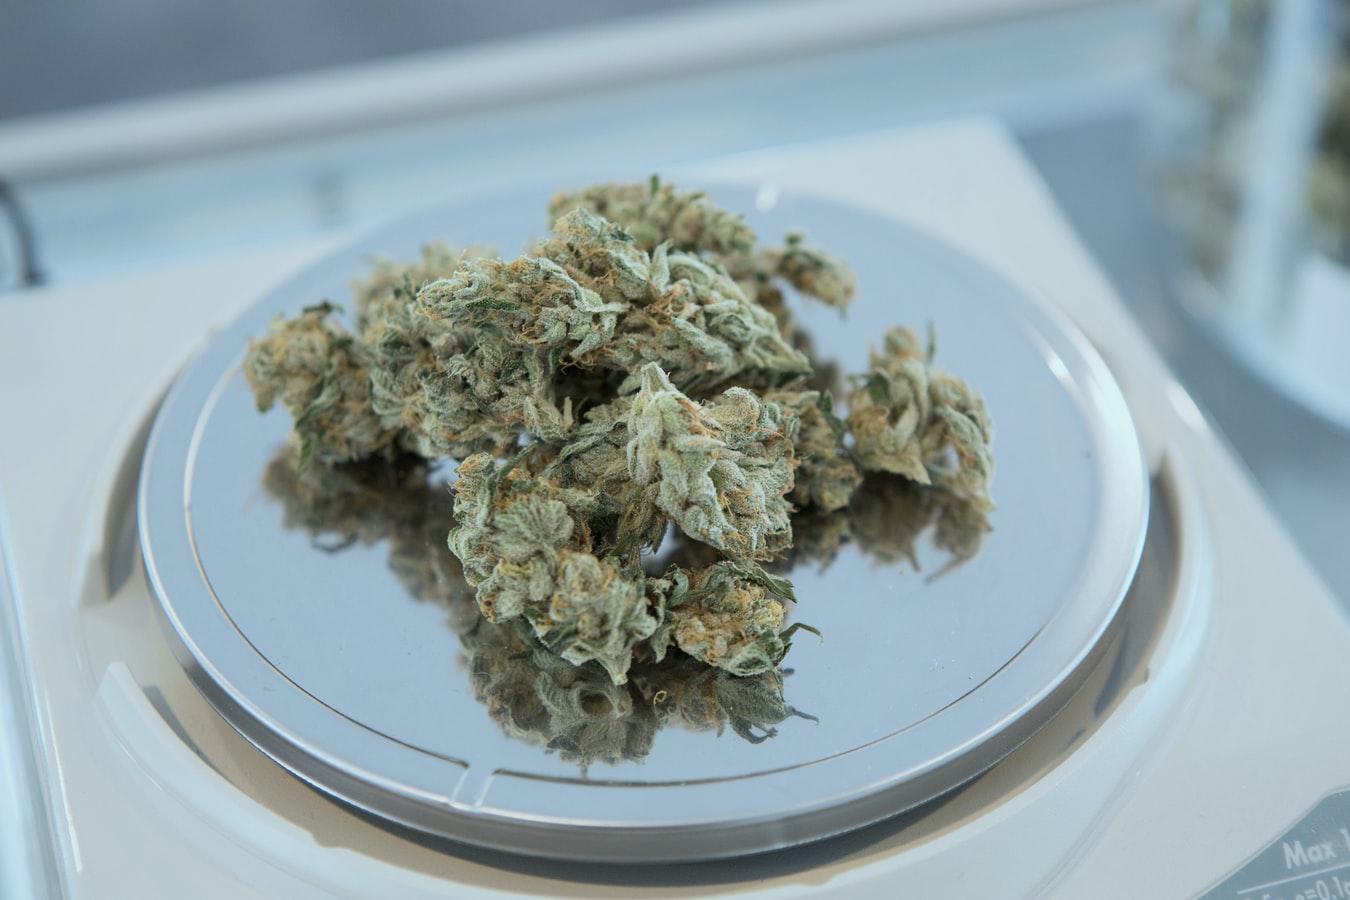 Virginia's First Medical Cannabis Dispensary